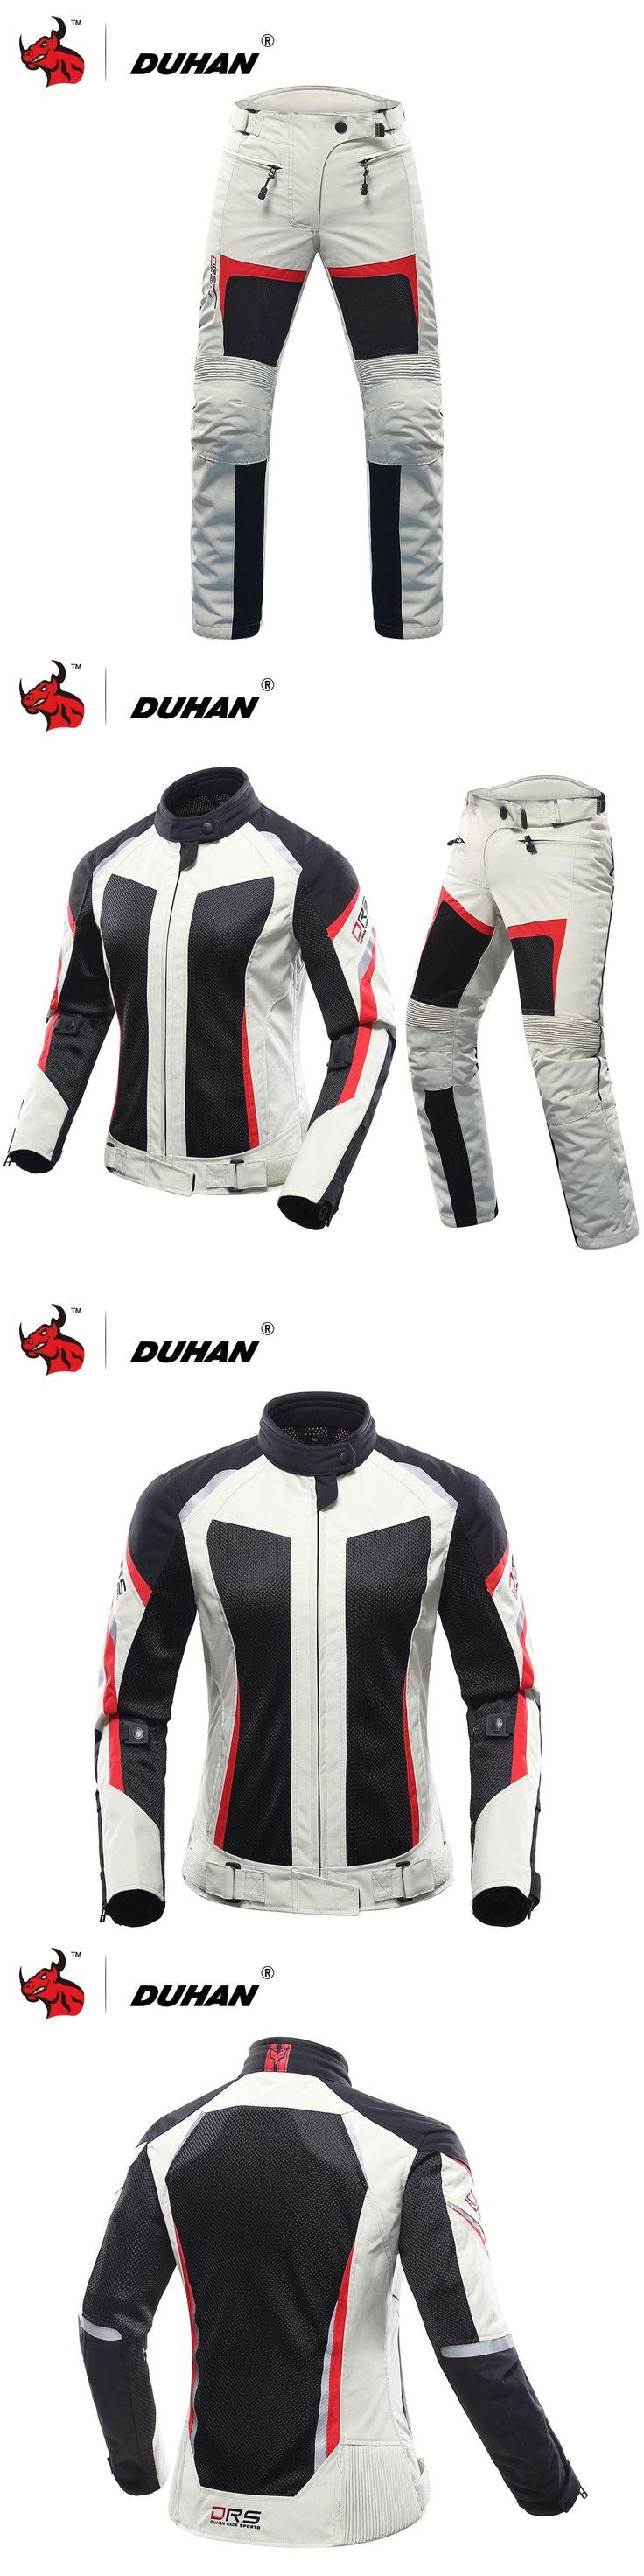 DUHAN Women Motorcycle Jacket+Motorcycle Pants Summer Breathable Motorcycle Suit Gray Racing Jacket Moto Jacket Blouson Moto